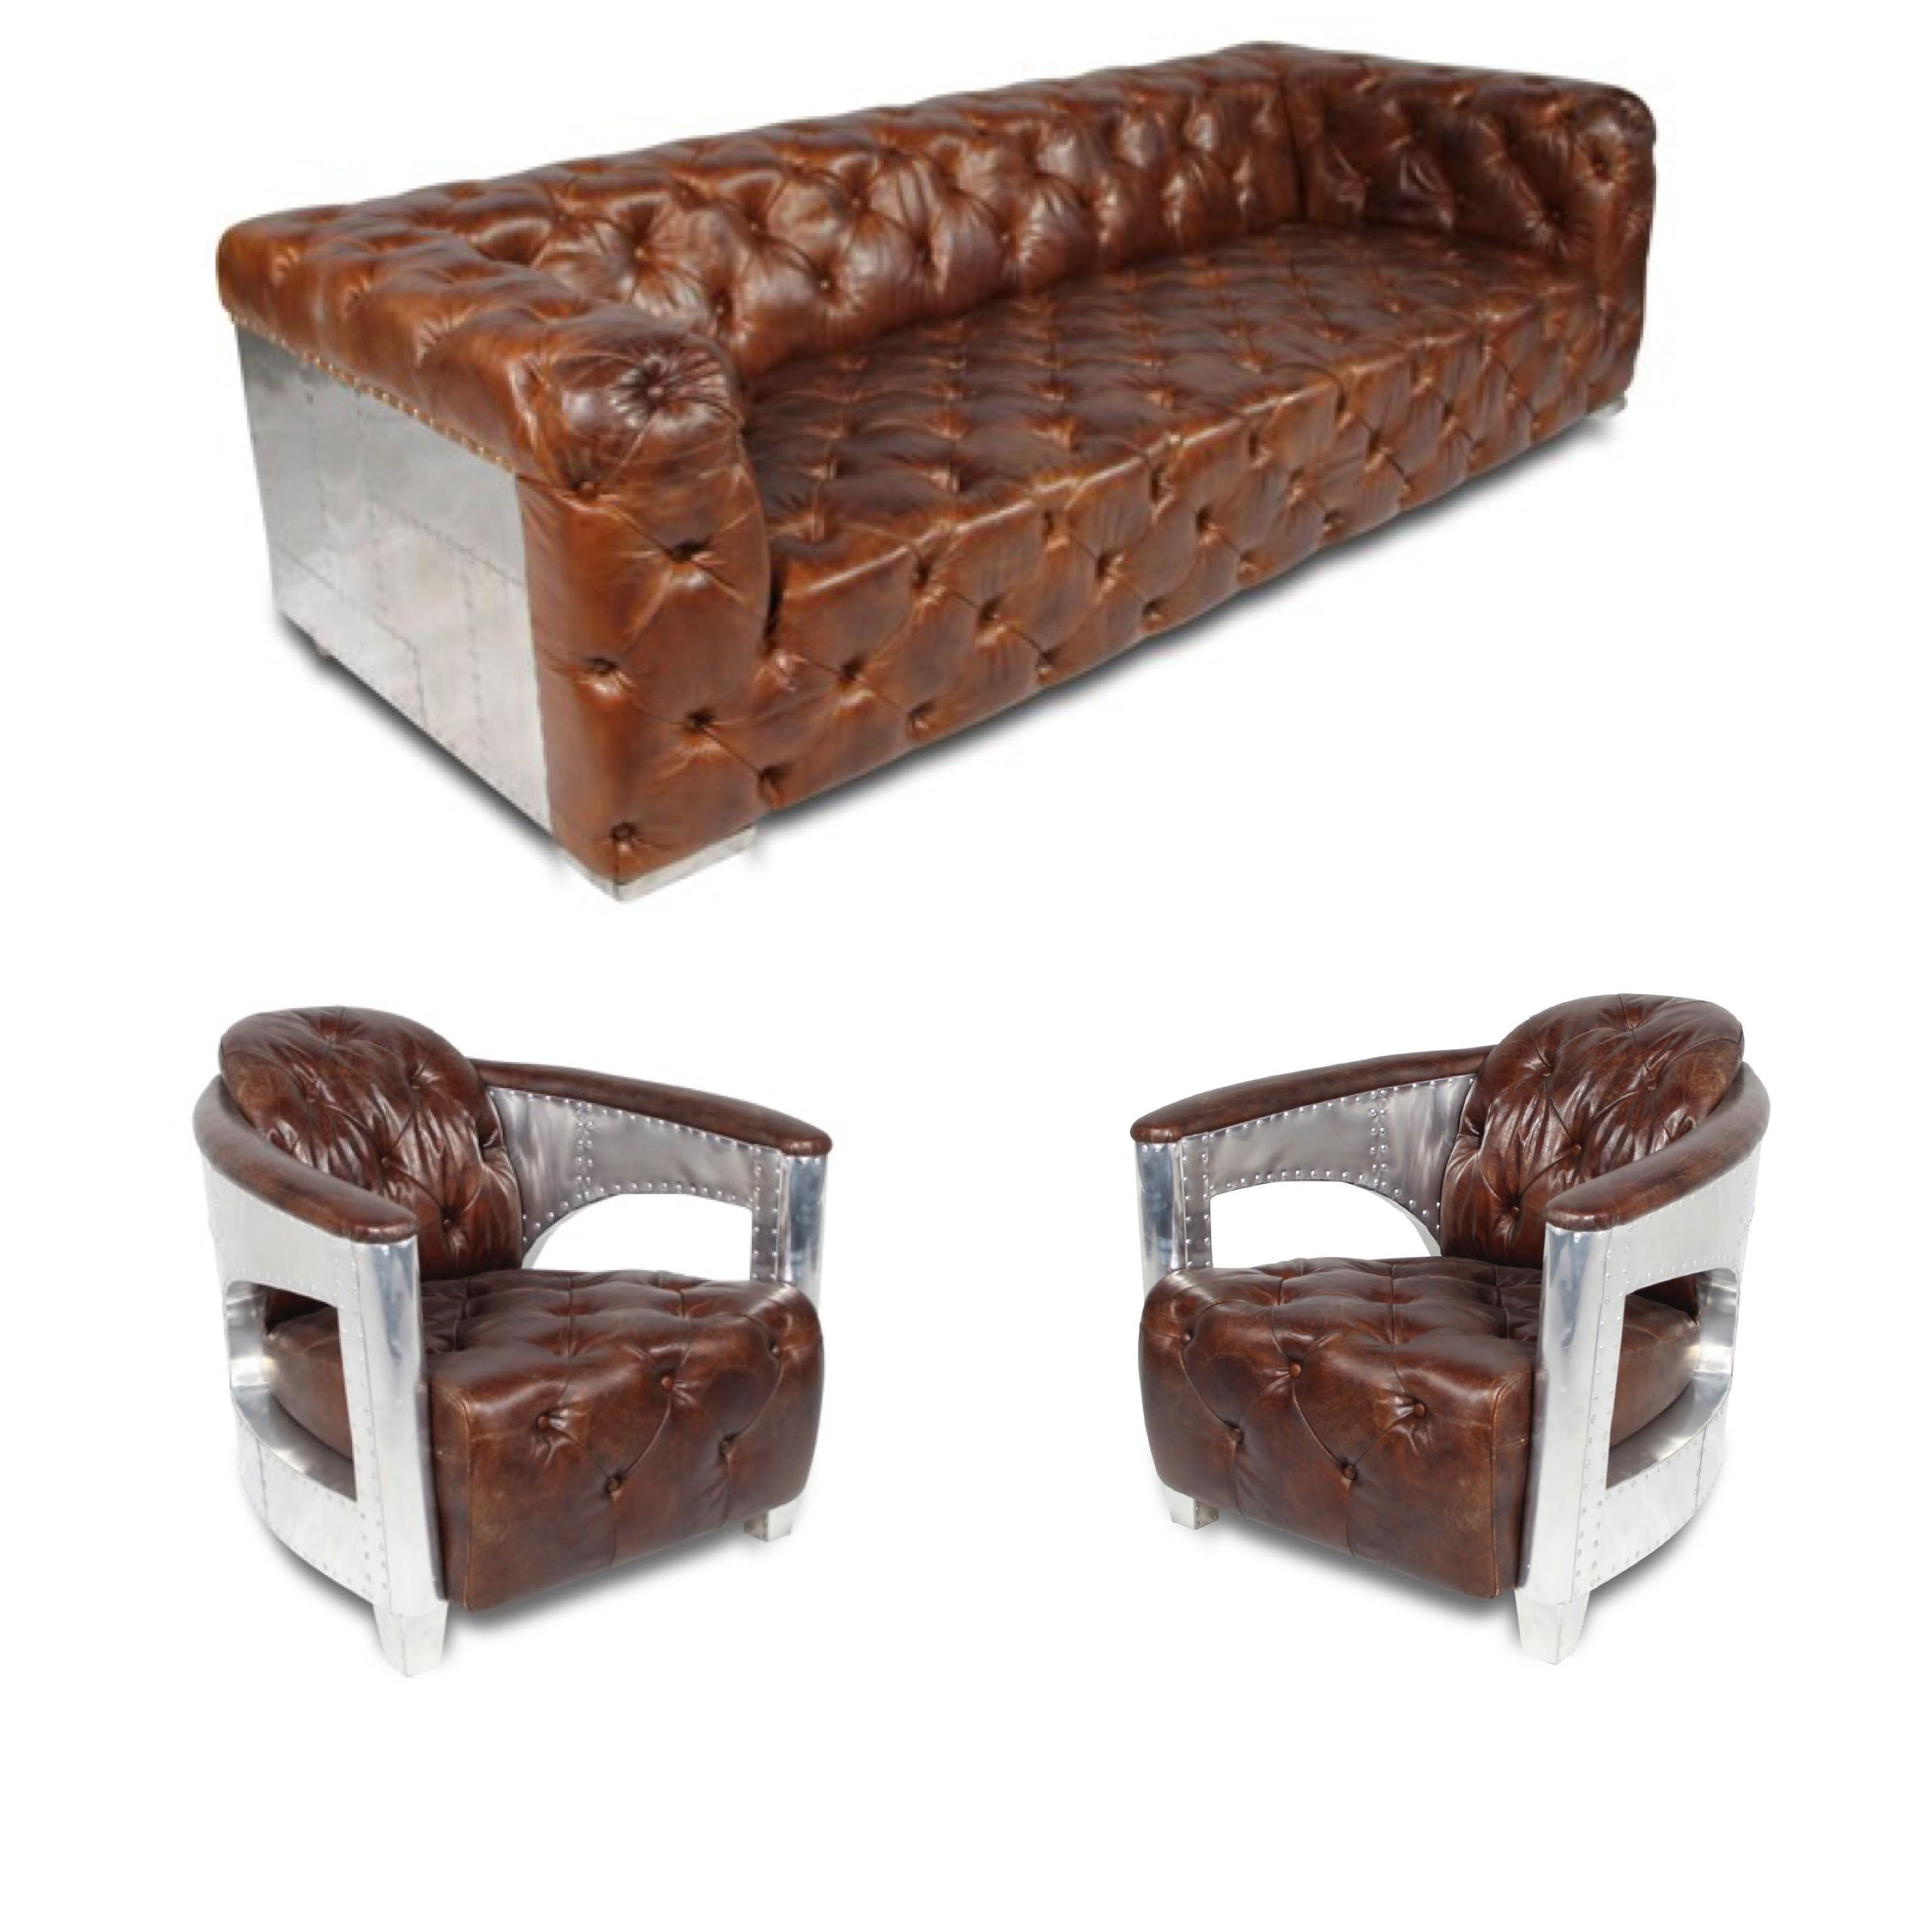 vintage leder chesterfield aviator sofa mit zwei gepolsterte sessel. Black Bedroom Furniture Sets. Home Design Ideas